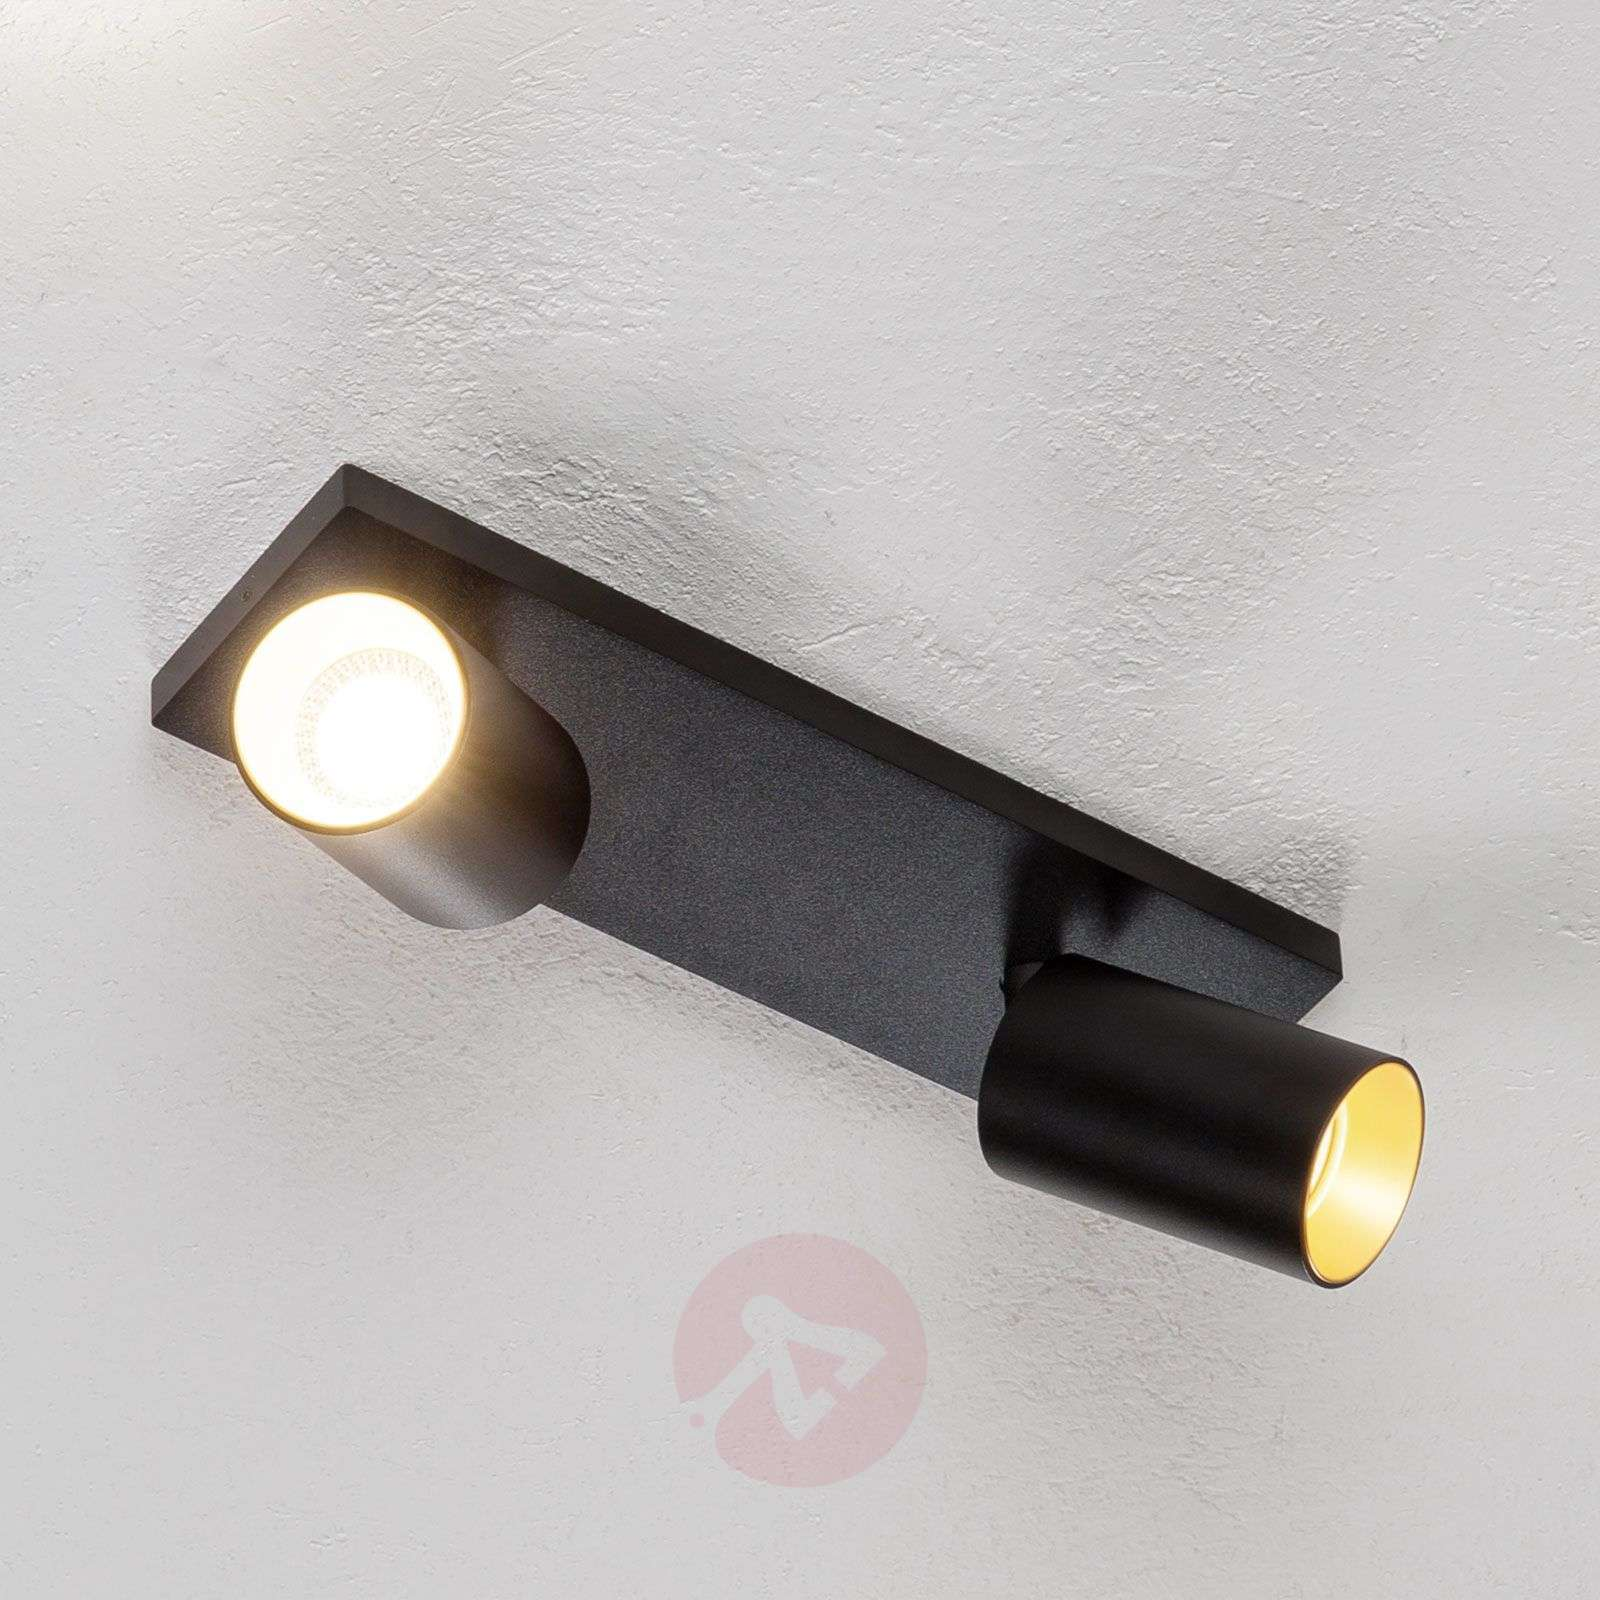 Kohdevalo Brinja GU10 musta 2 lamppua-9928018-01